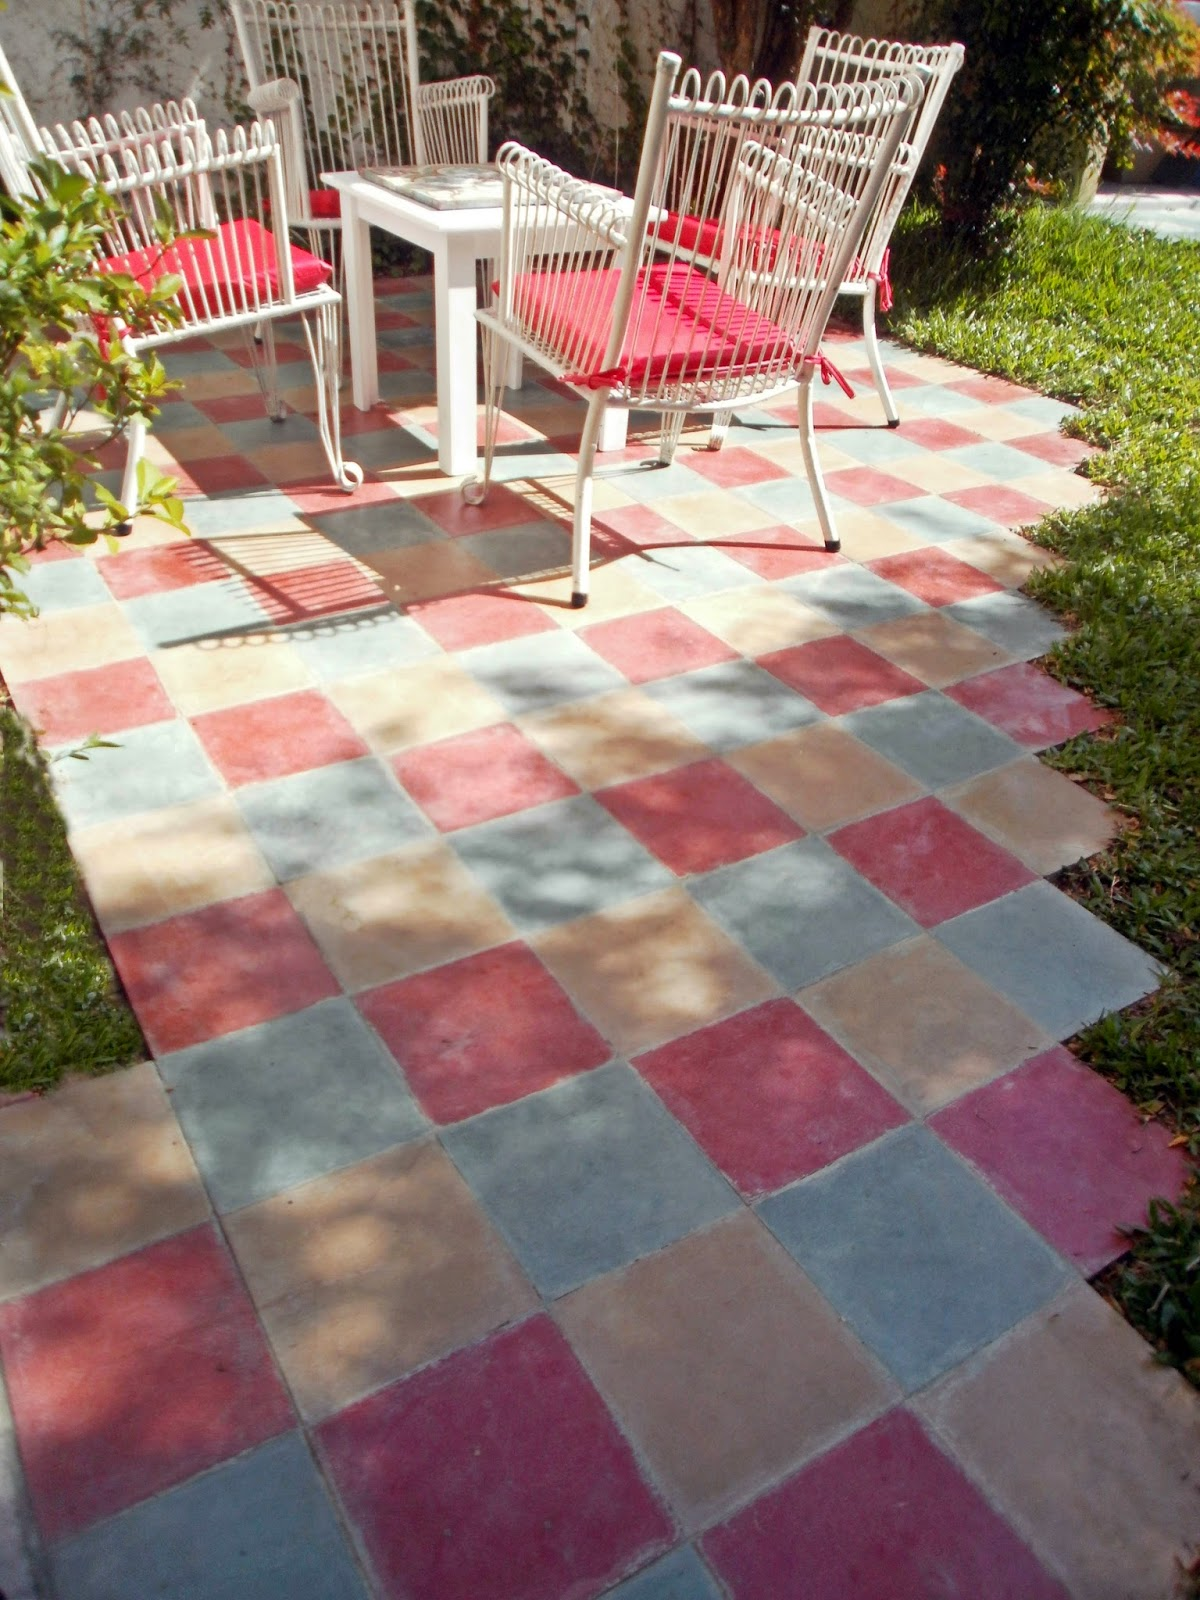 Quadrat jardin de primavera for Jardines de primavera